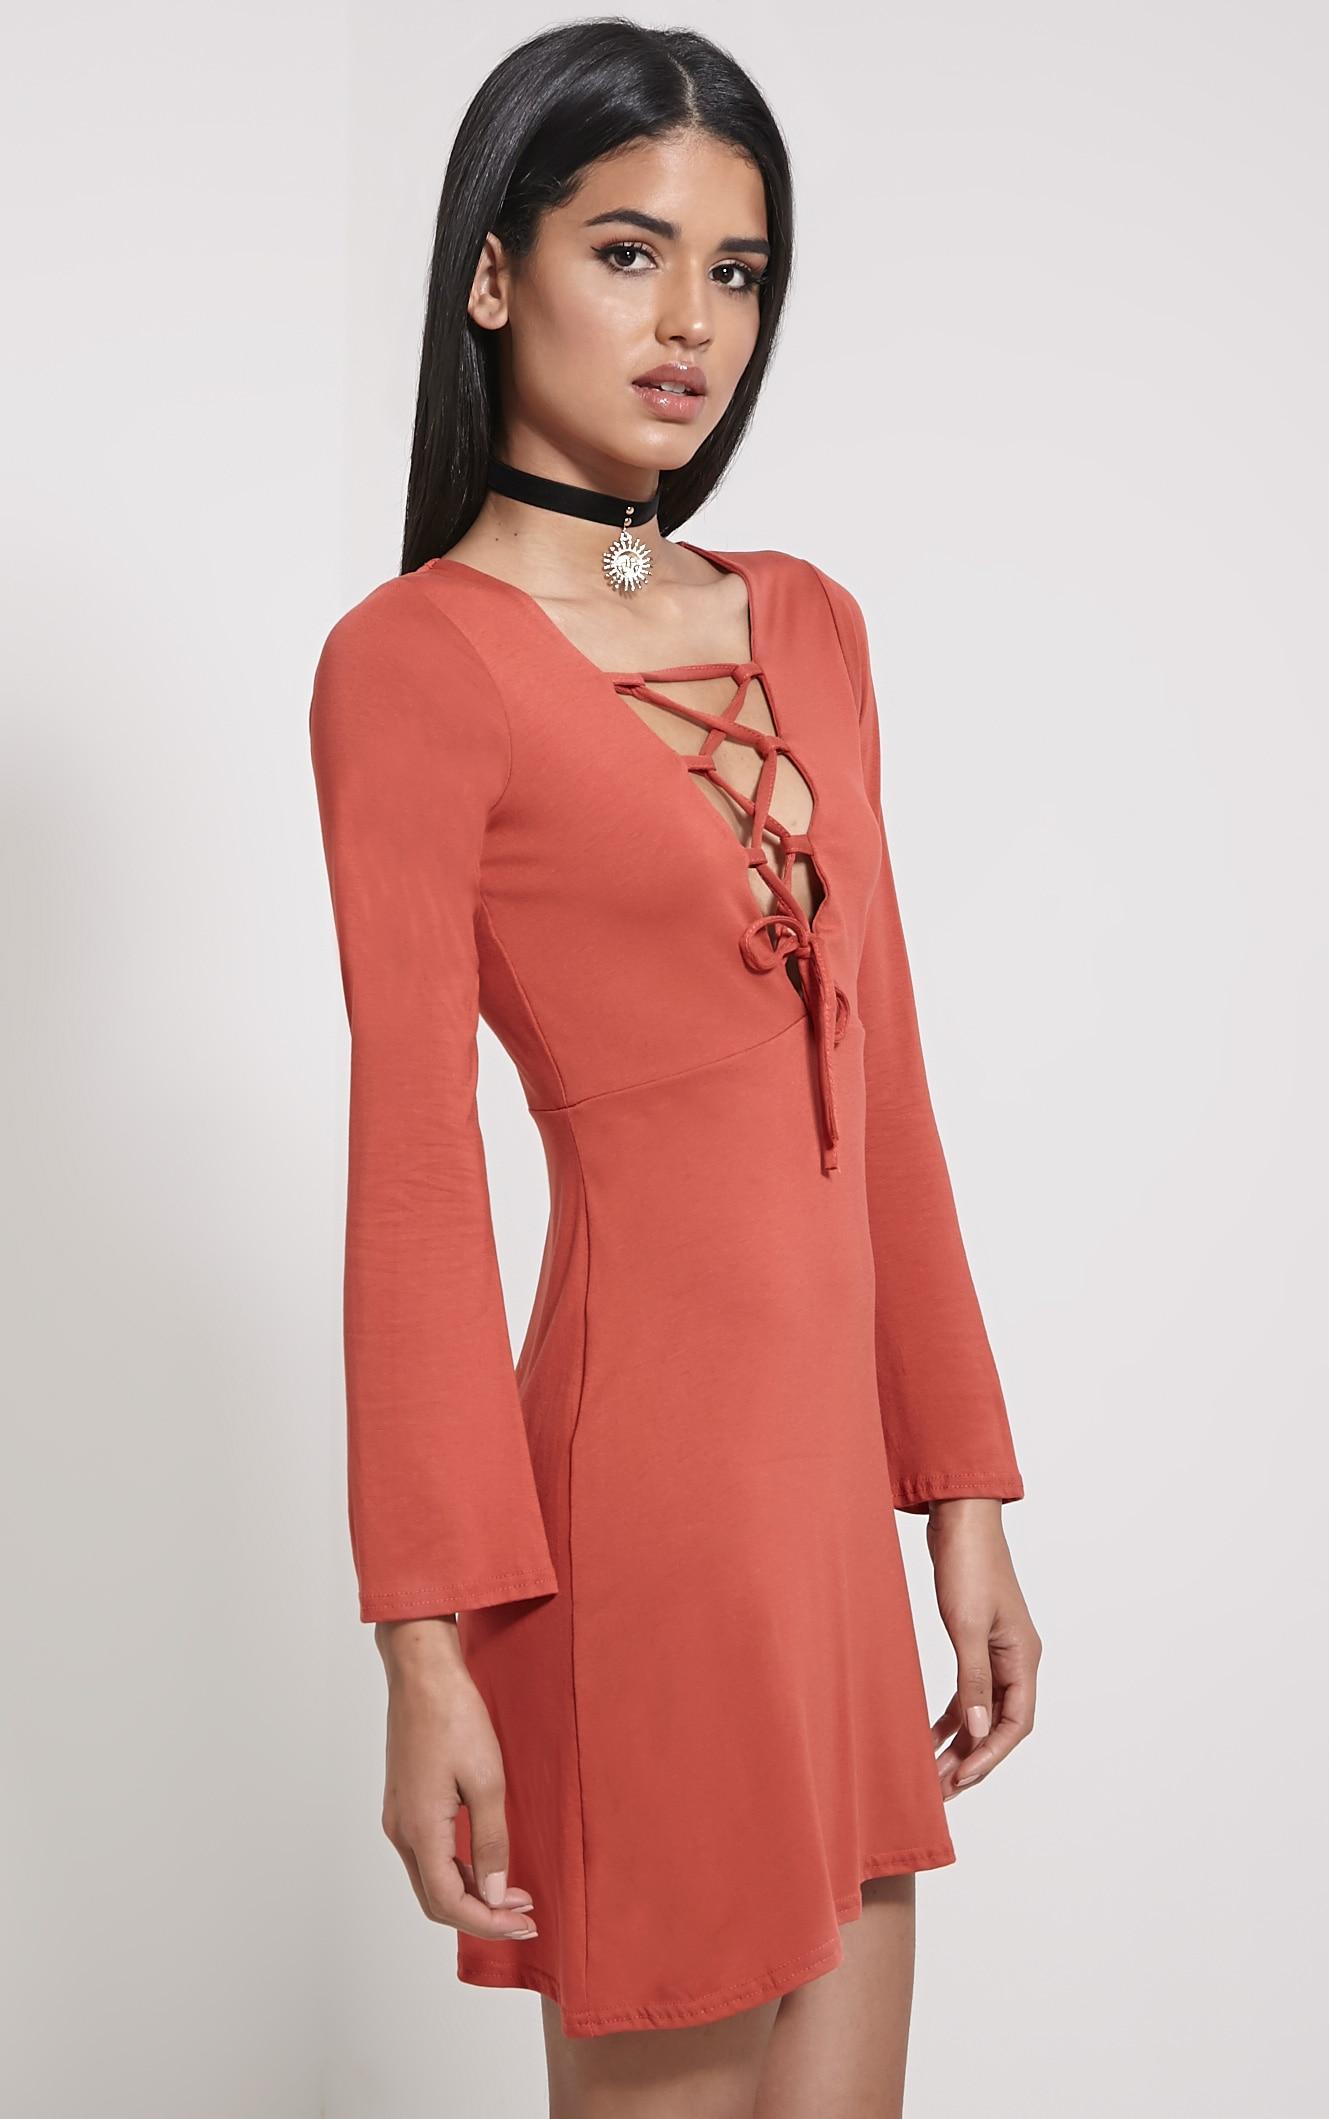 Remilda Rust Lace Up Jersey Dress 4